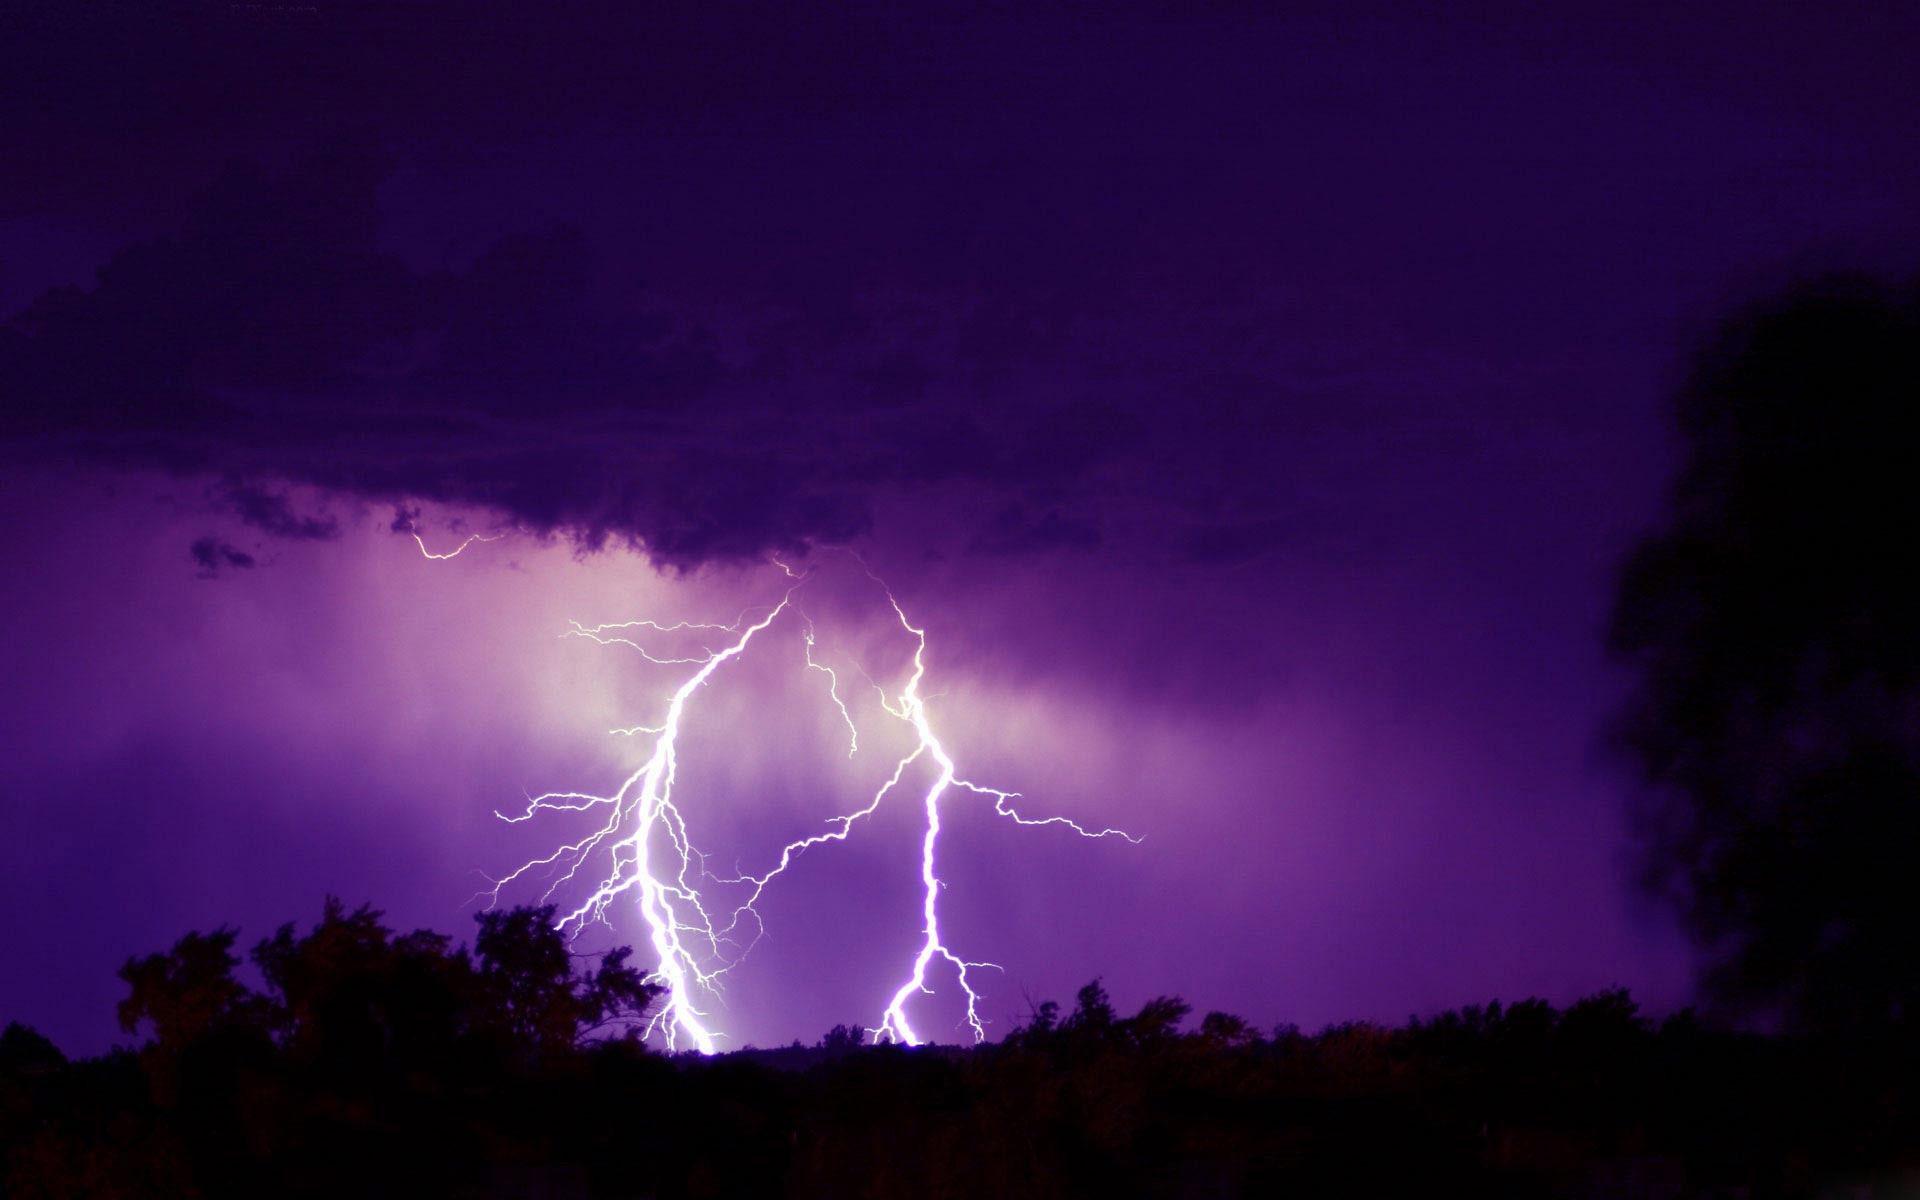 43+] Tornado Live Wallpaper Download on ...